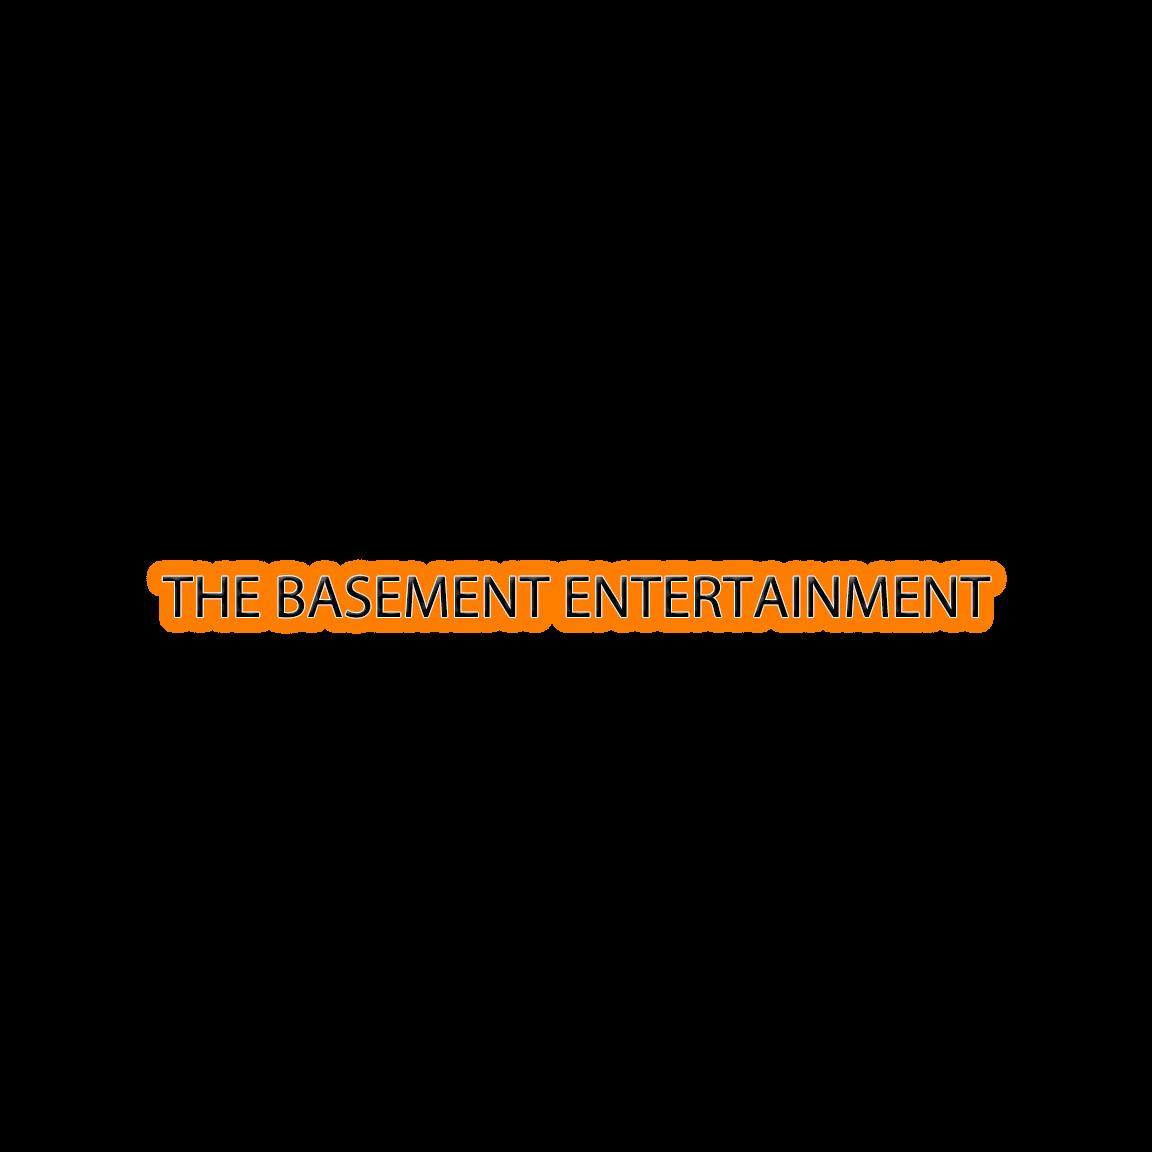 The Basement Entertainment